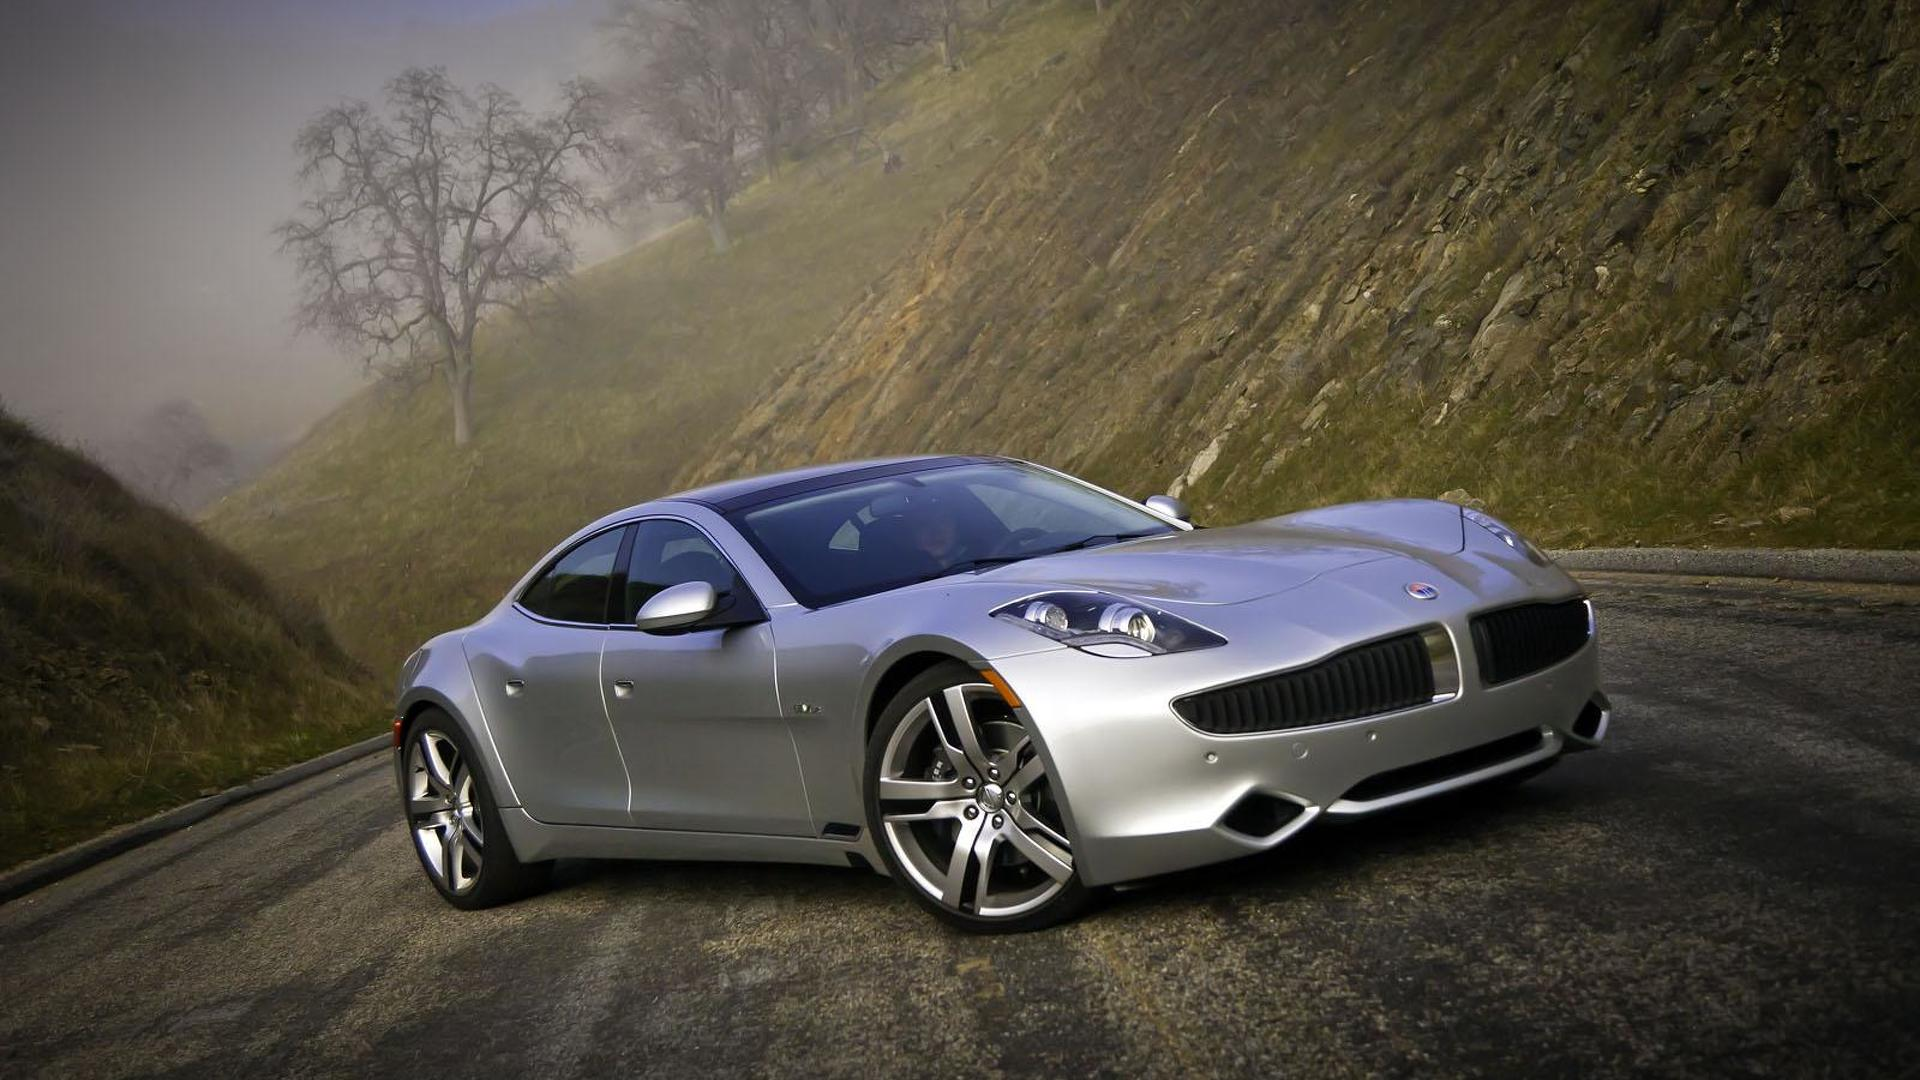 Karma Automotive to set up shop in Michigan